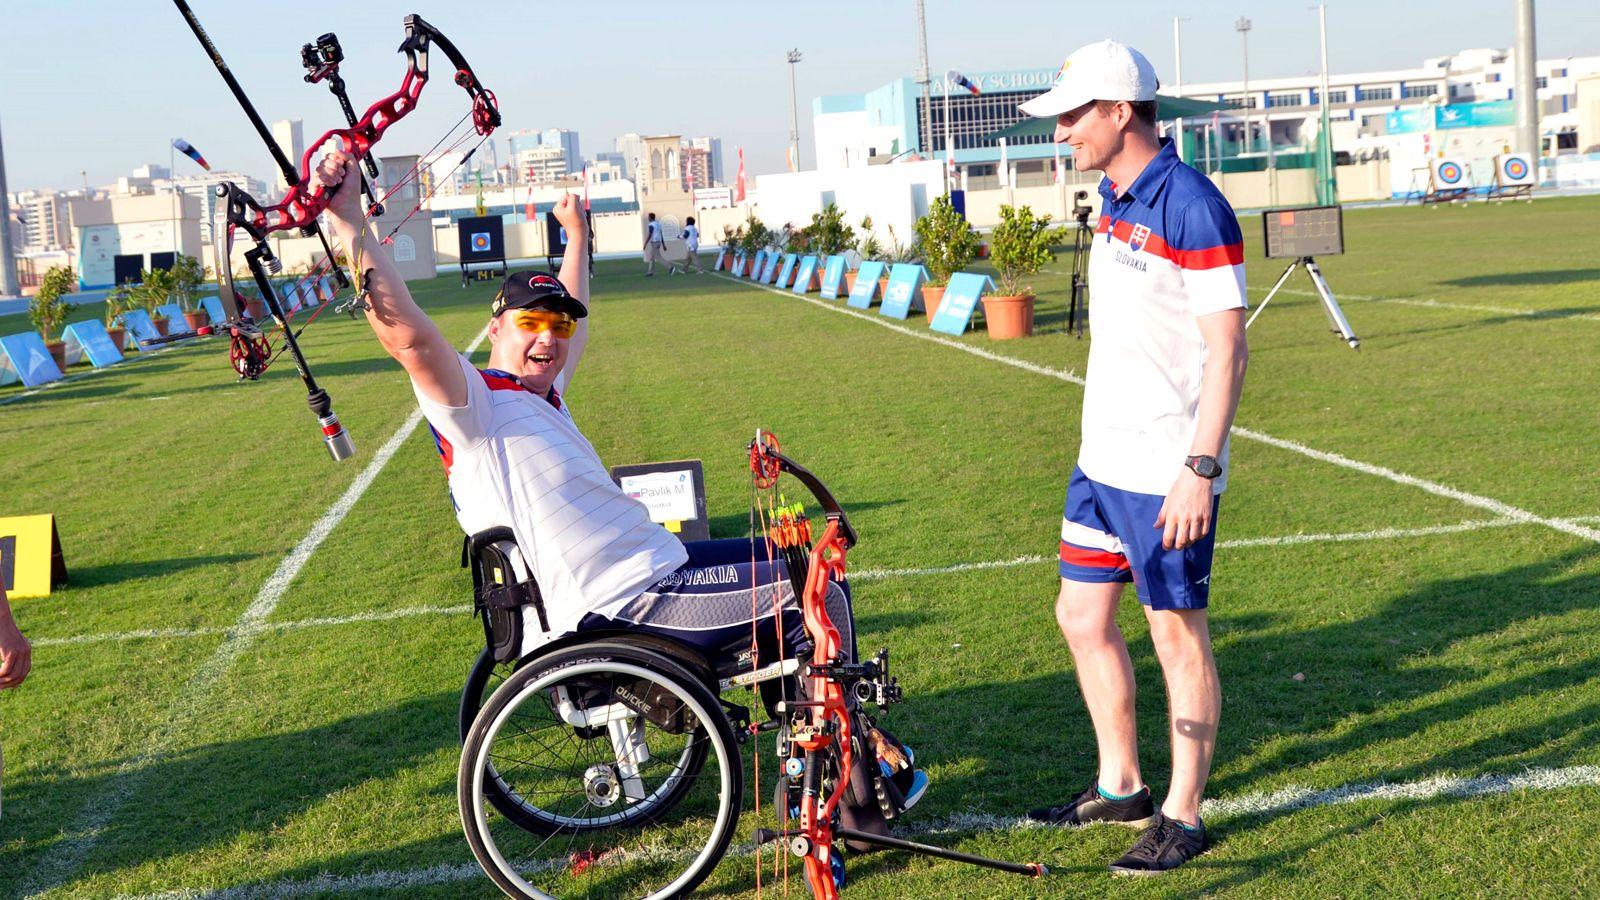 Dubai named as host of 2021 World Archery Para